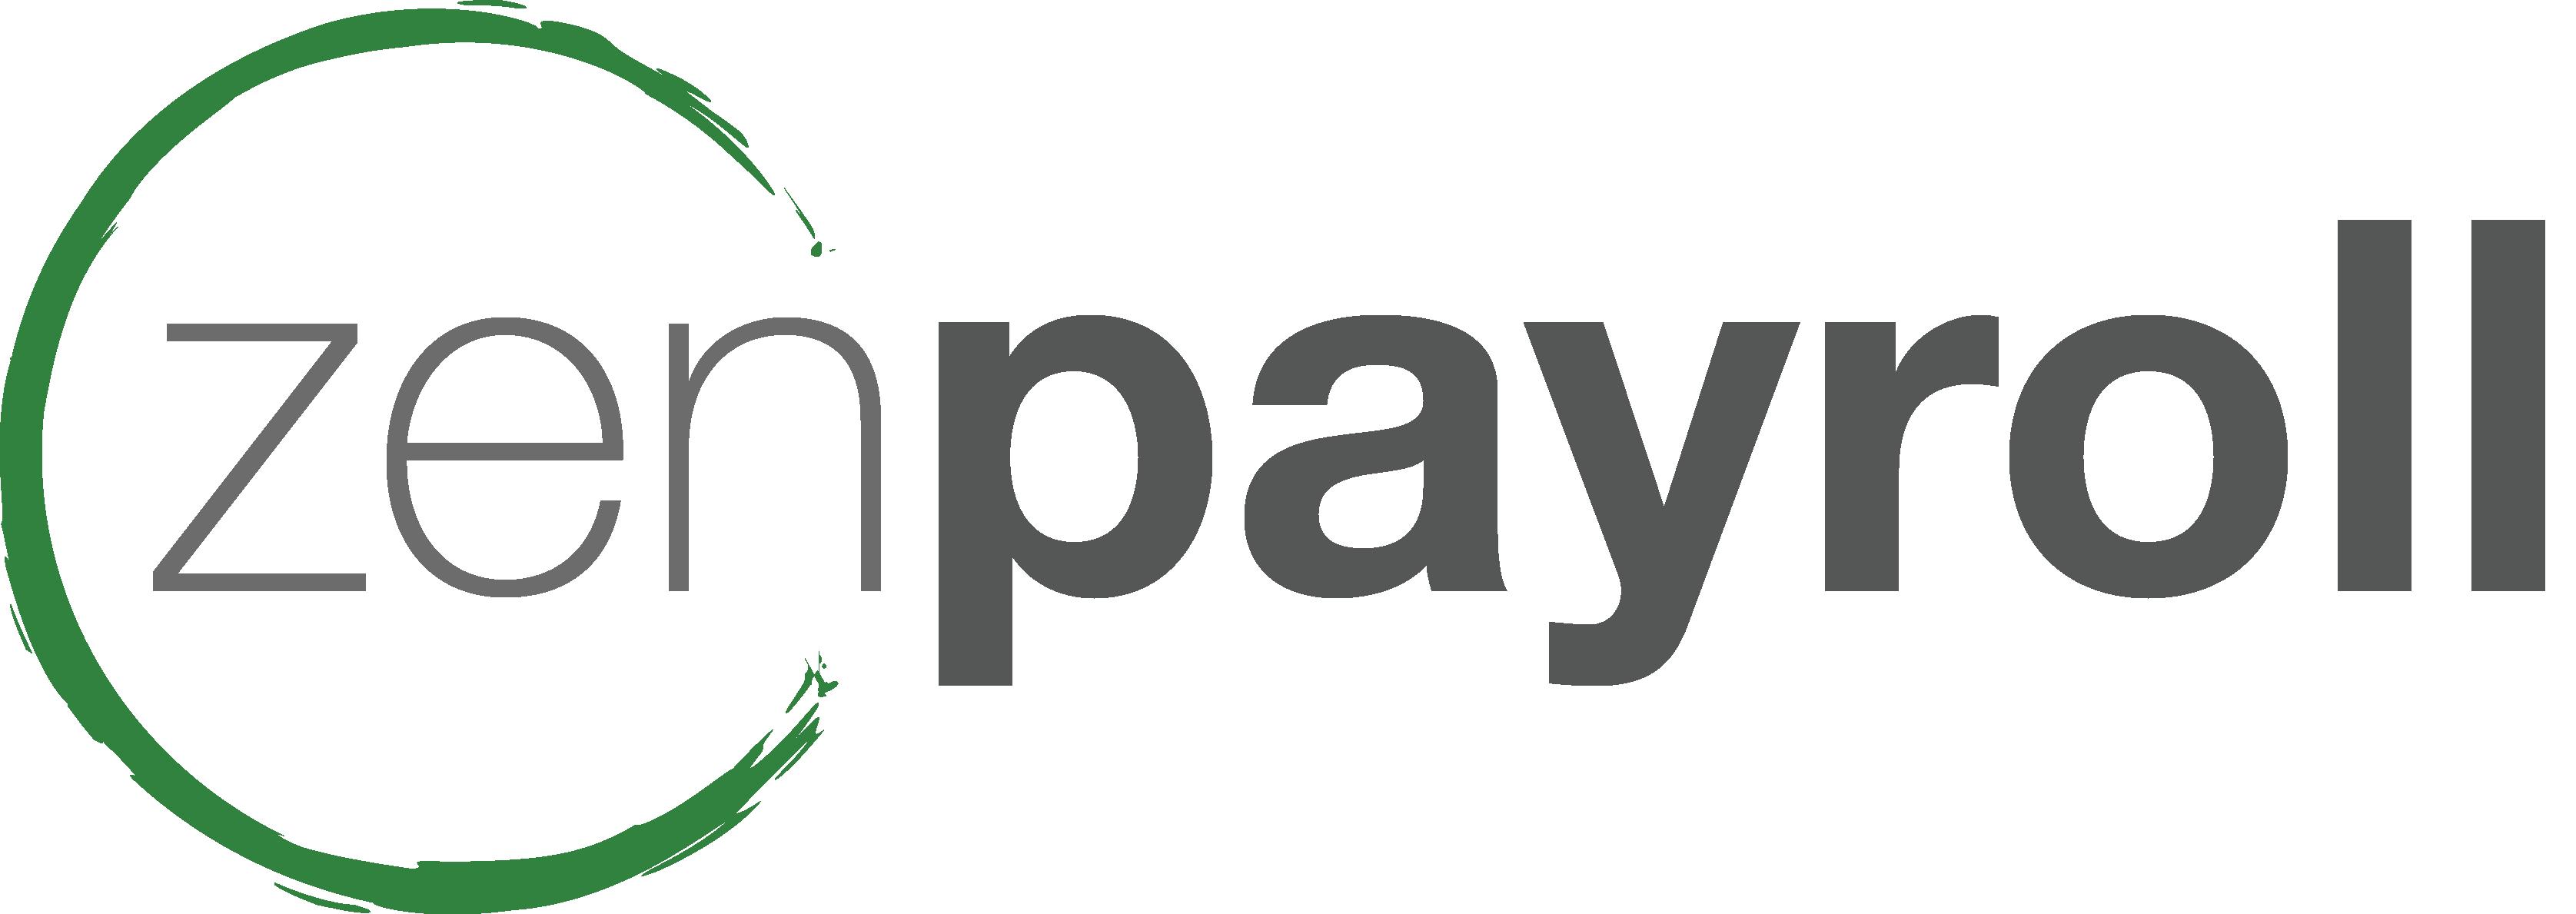 zenpayroll logo